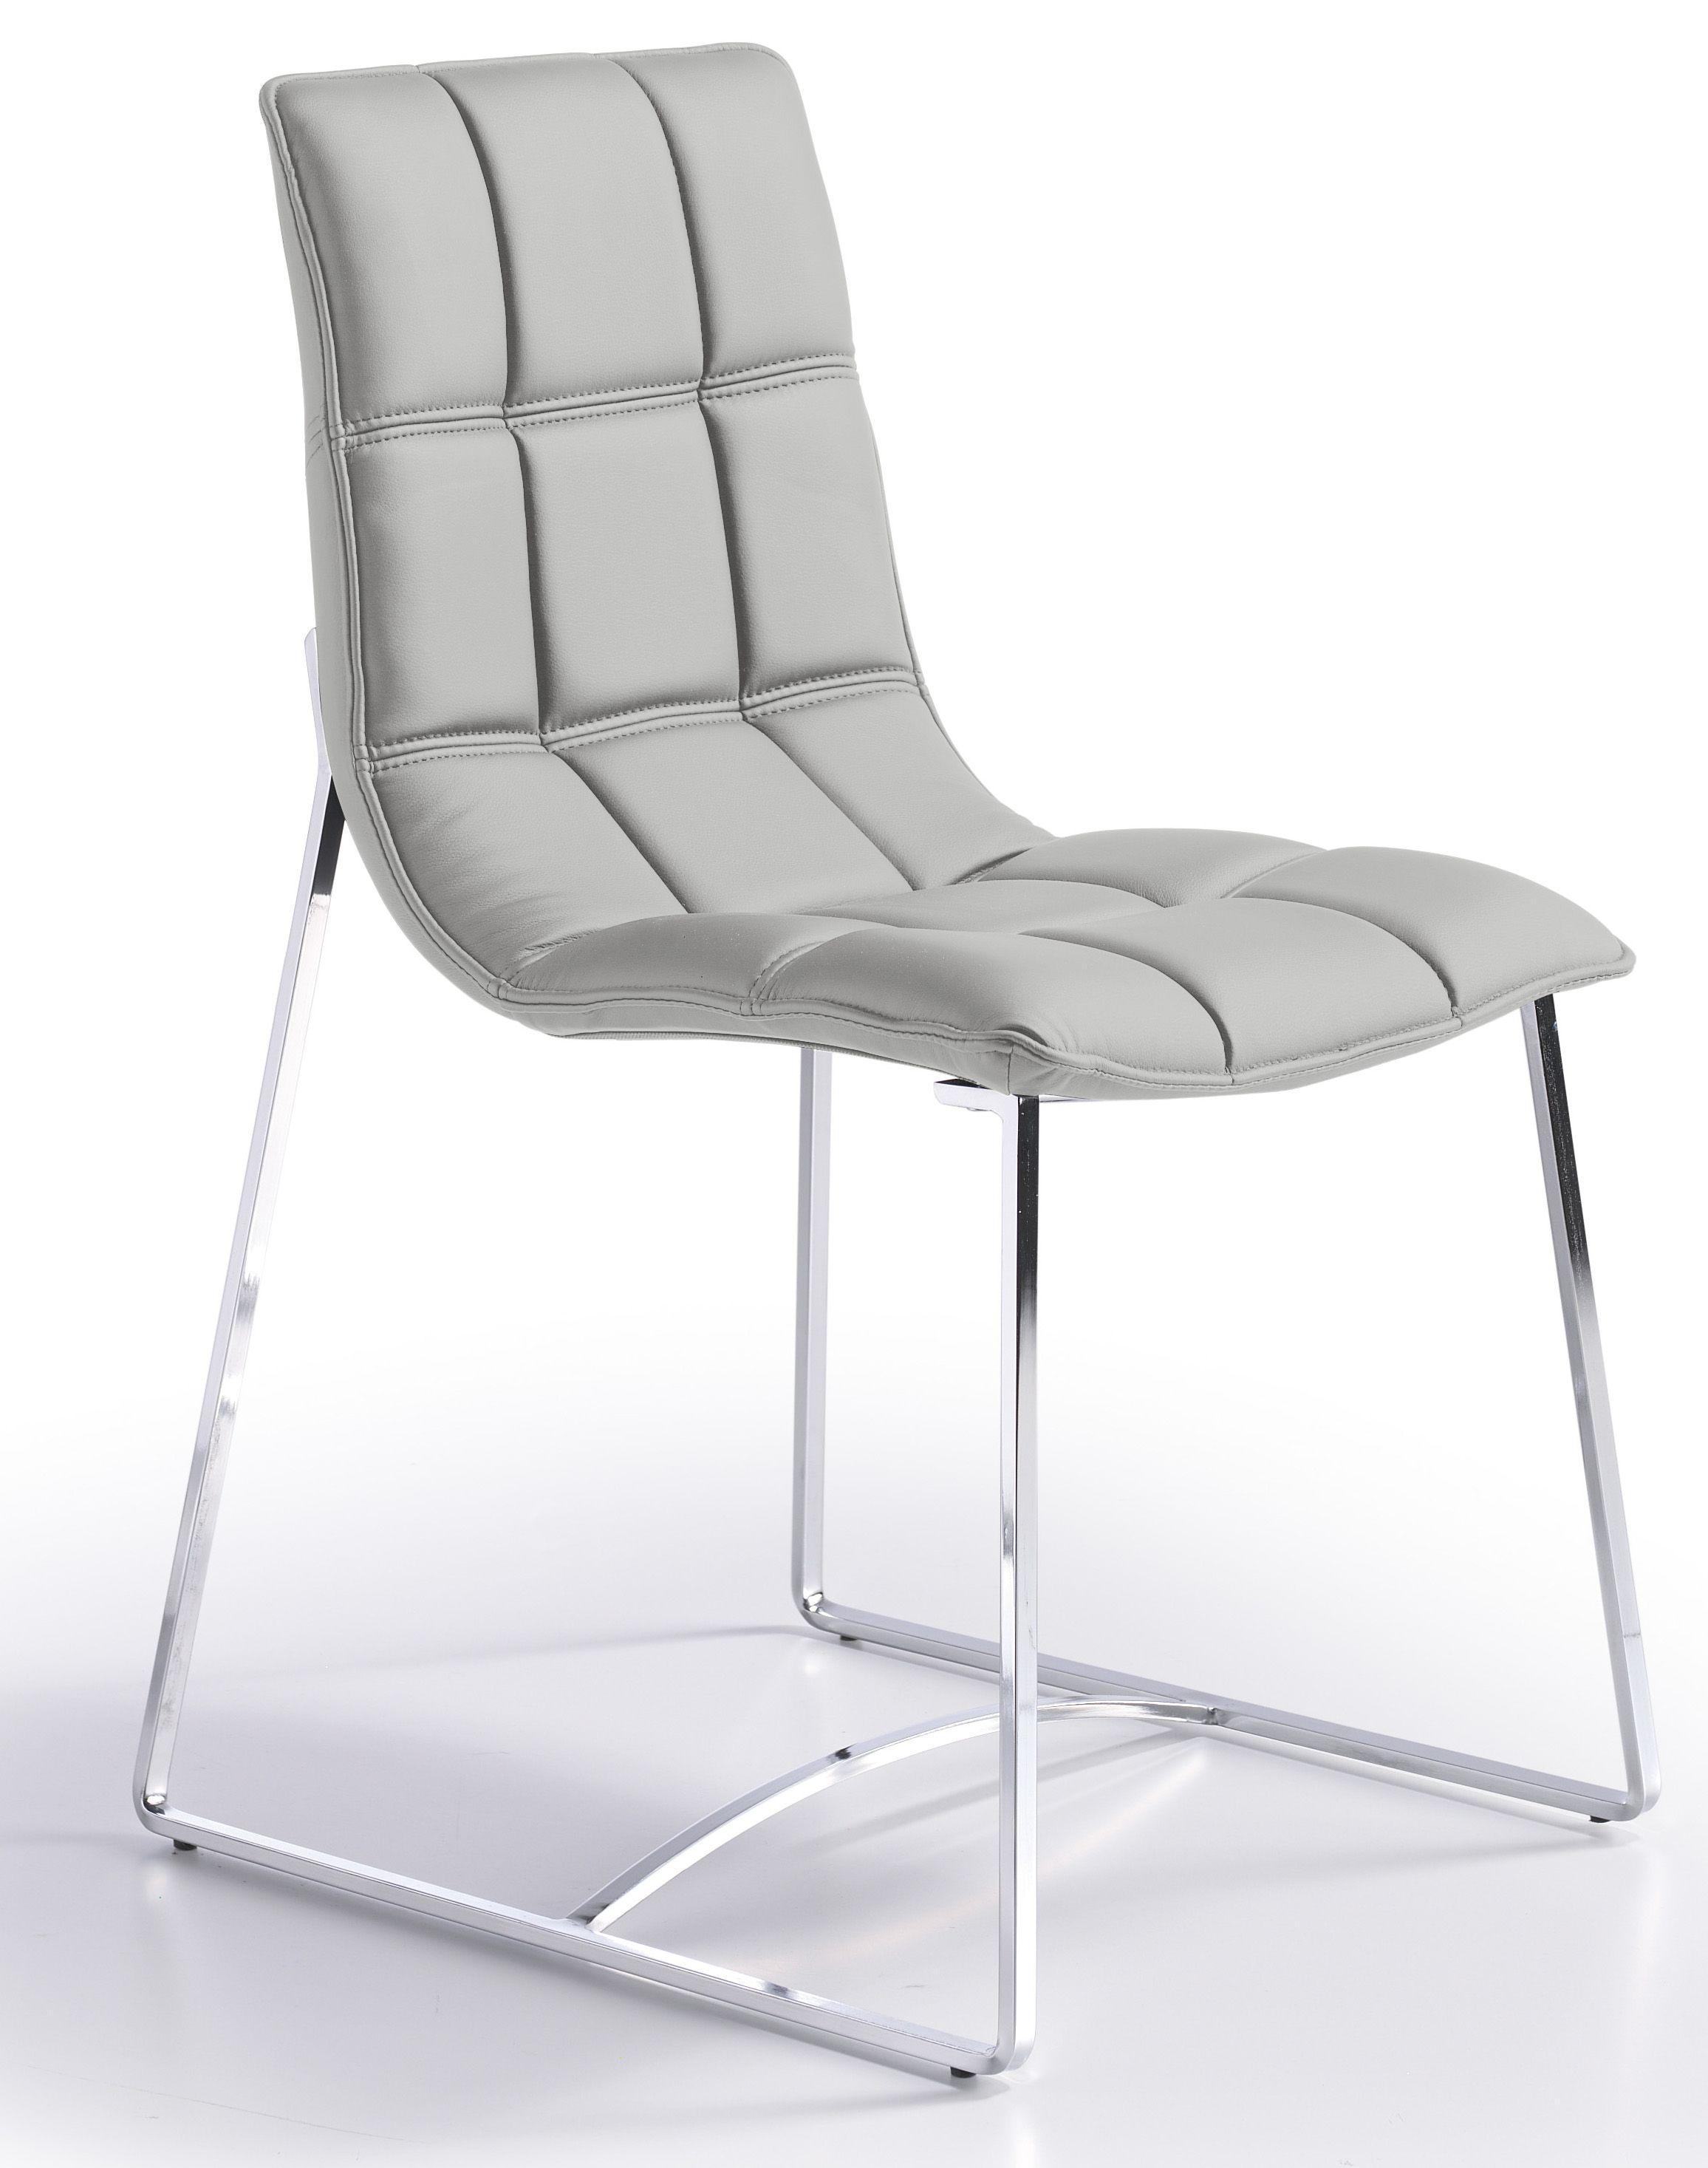 Designer Chaise design matelassée simili gris perle Koza